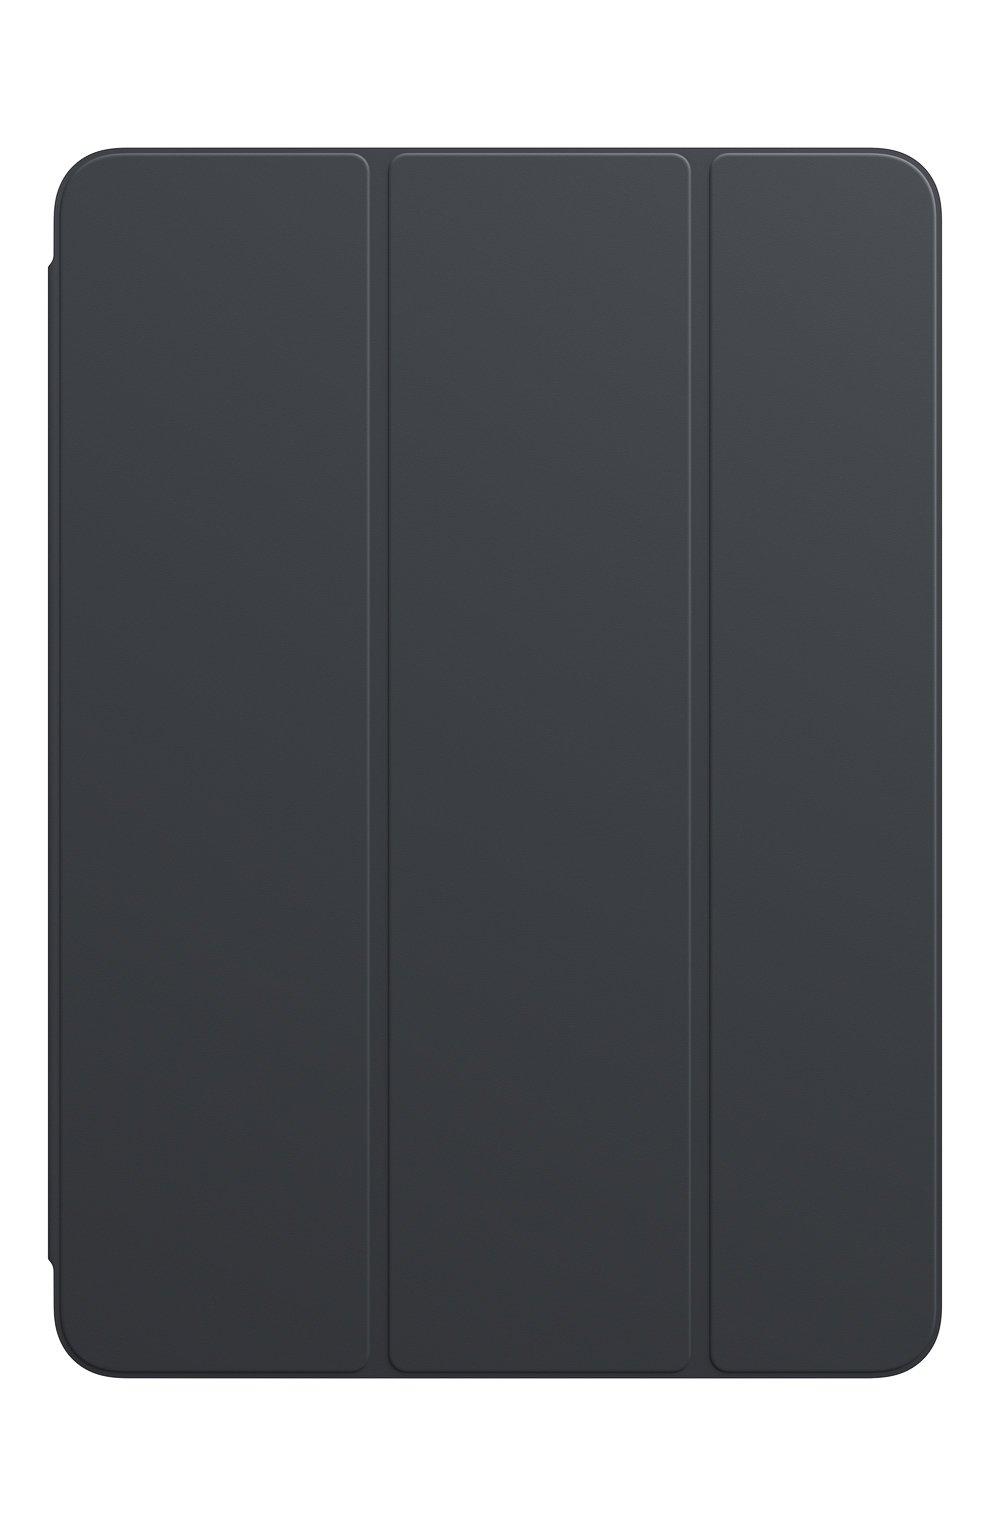 "Обложка smart folio для ipad pro 11"" APPLE  темно-серого цвета, арт. MRX72ZM/A | Фото 1"